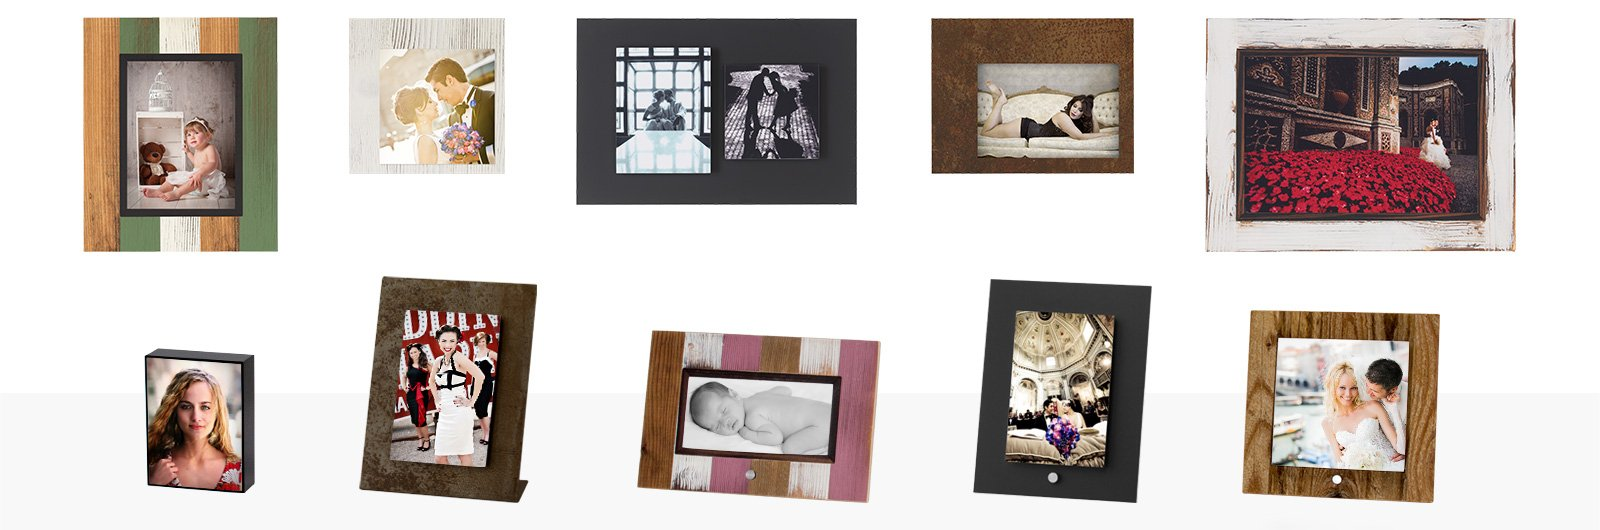 cornici-legno-artigianali.jpg.1600x530_q85_crop.jpg